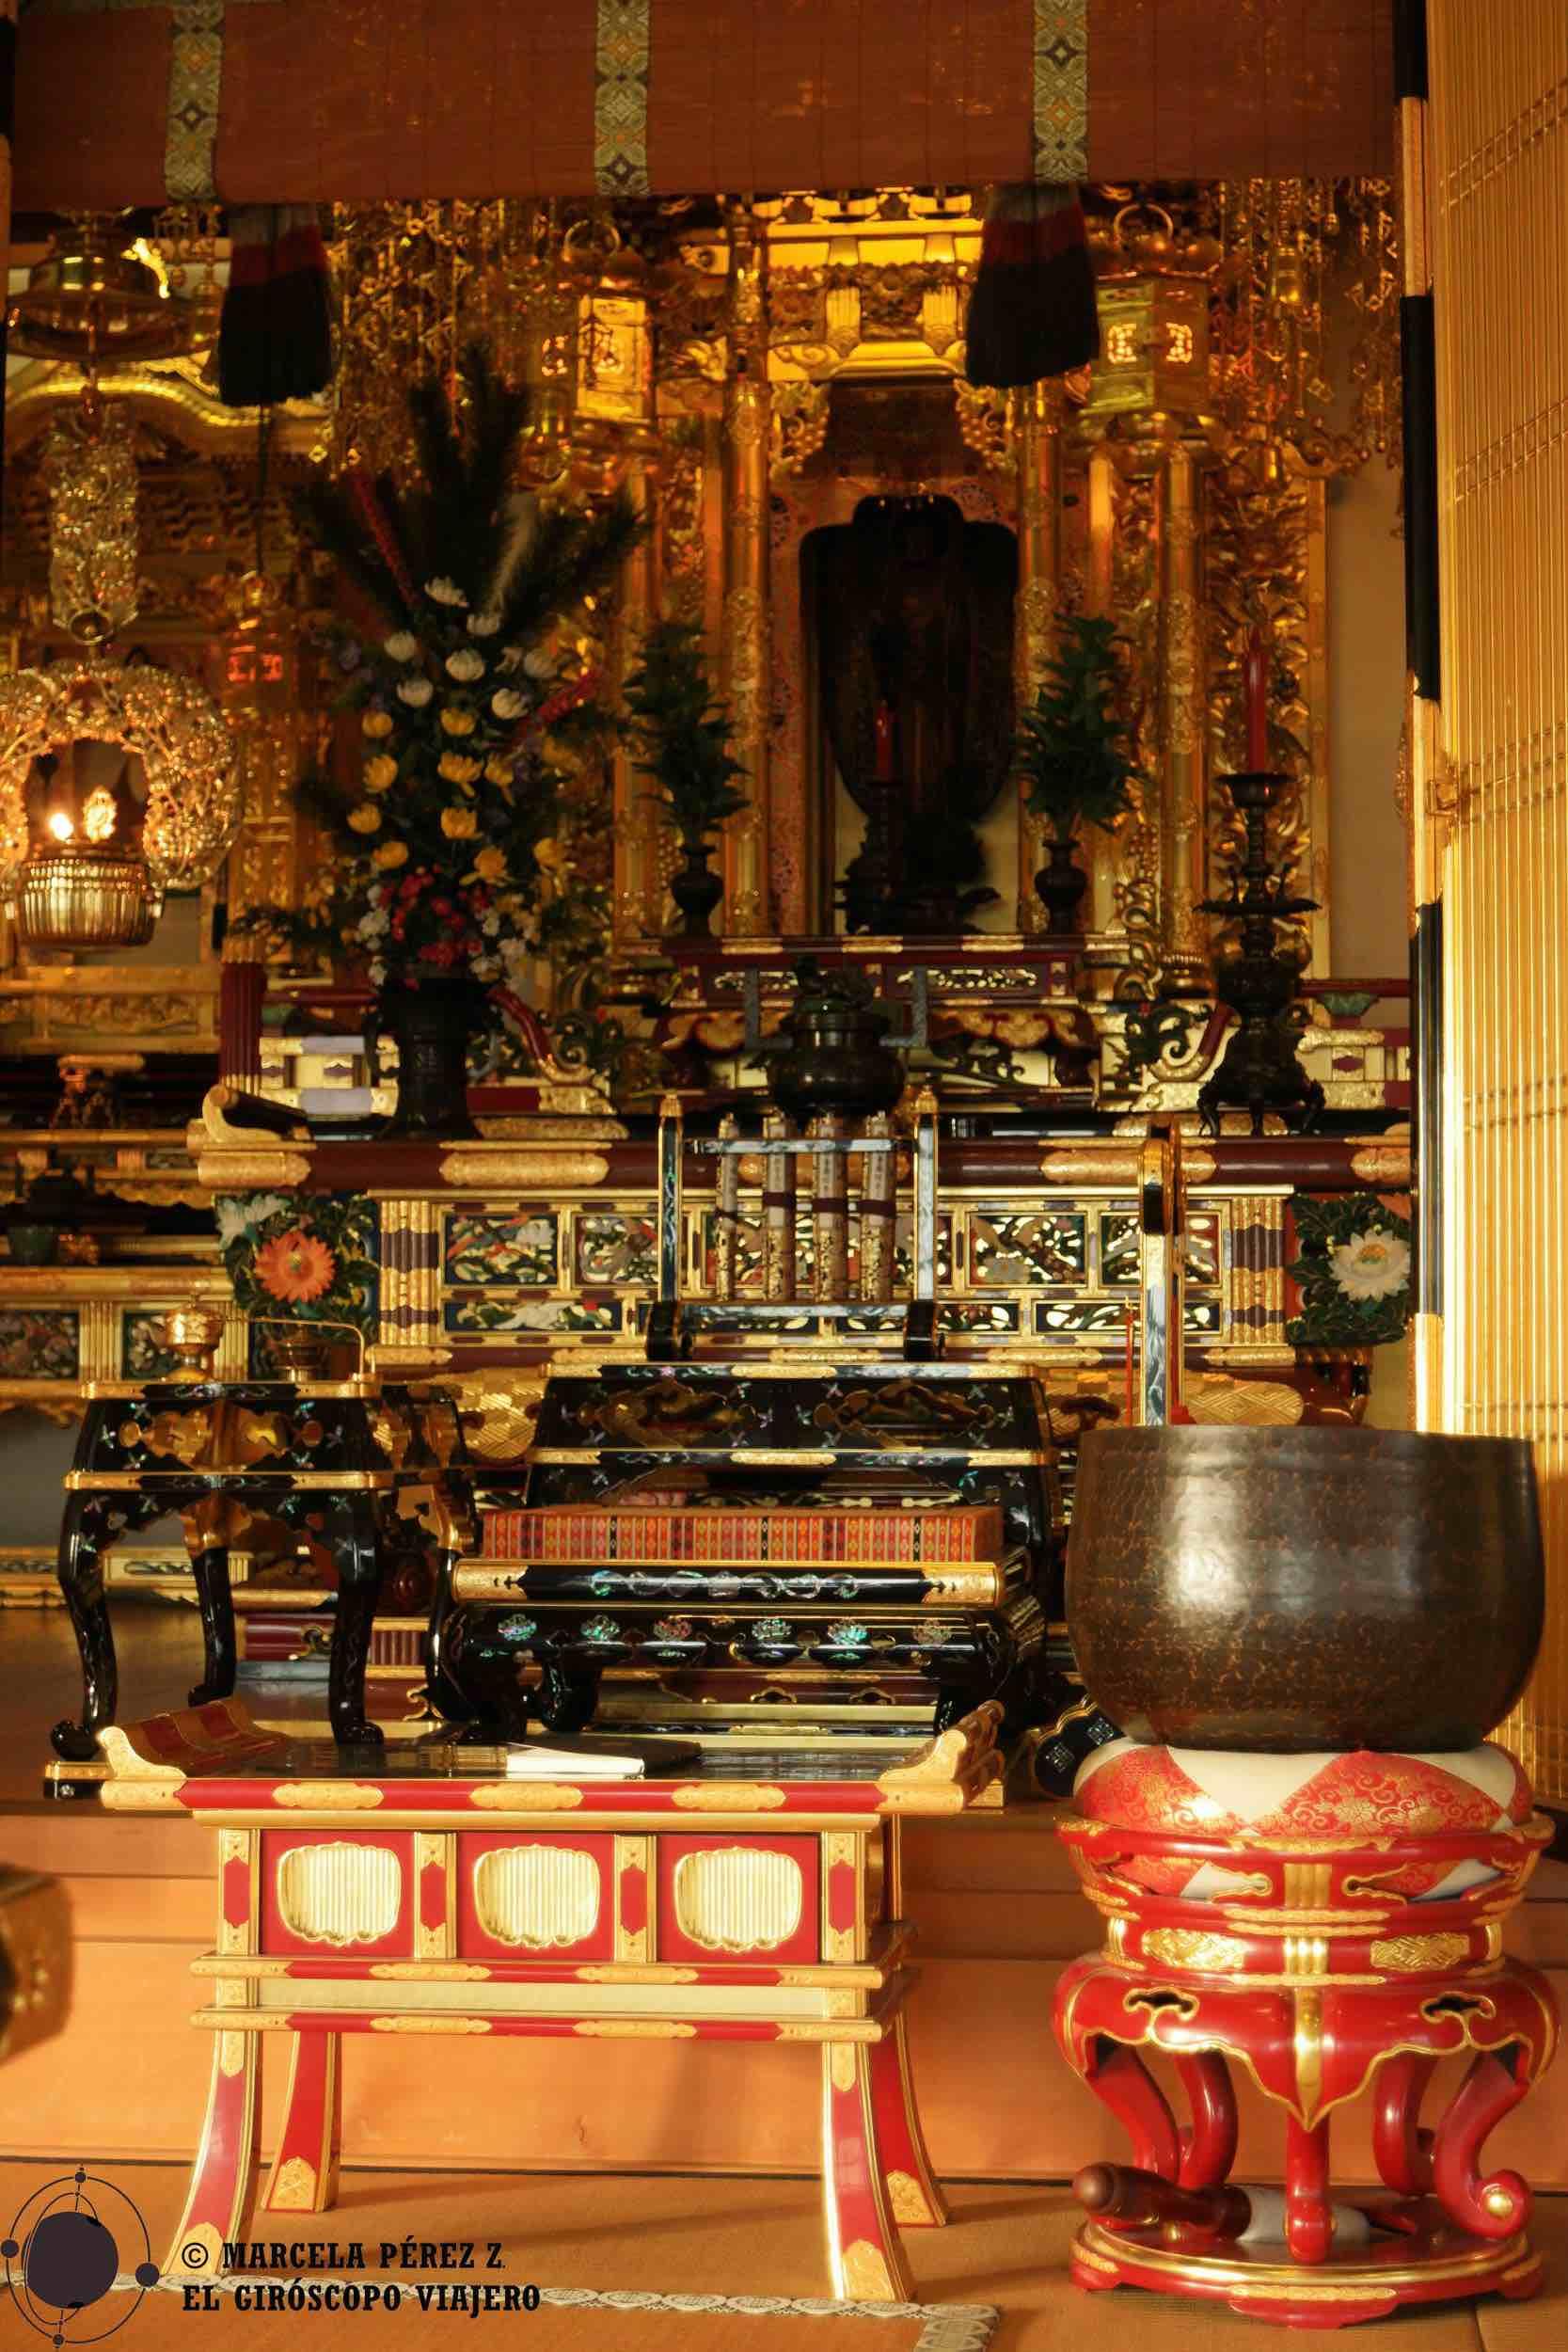 Templo budista en el Centro Cultural Japonés de Düsseldorf